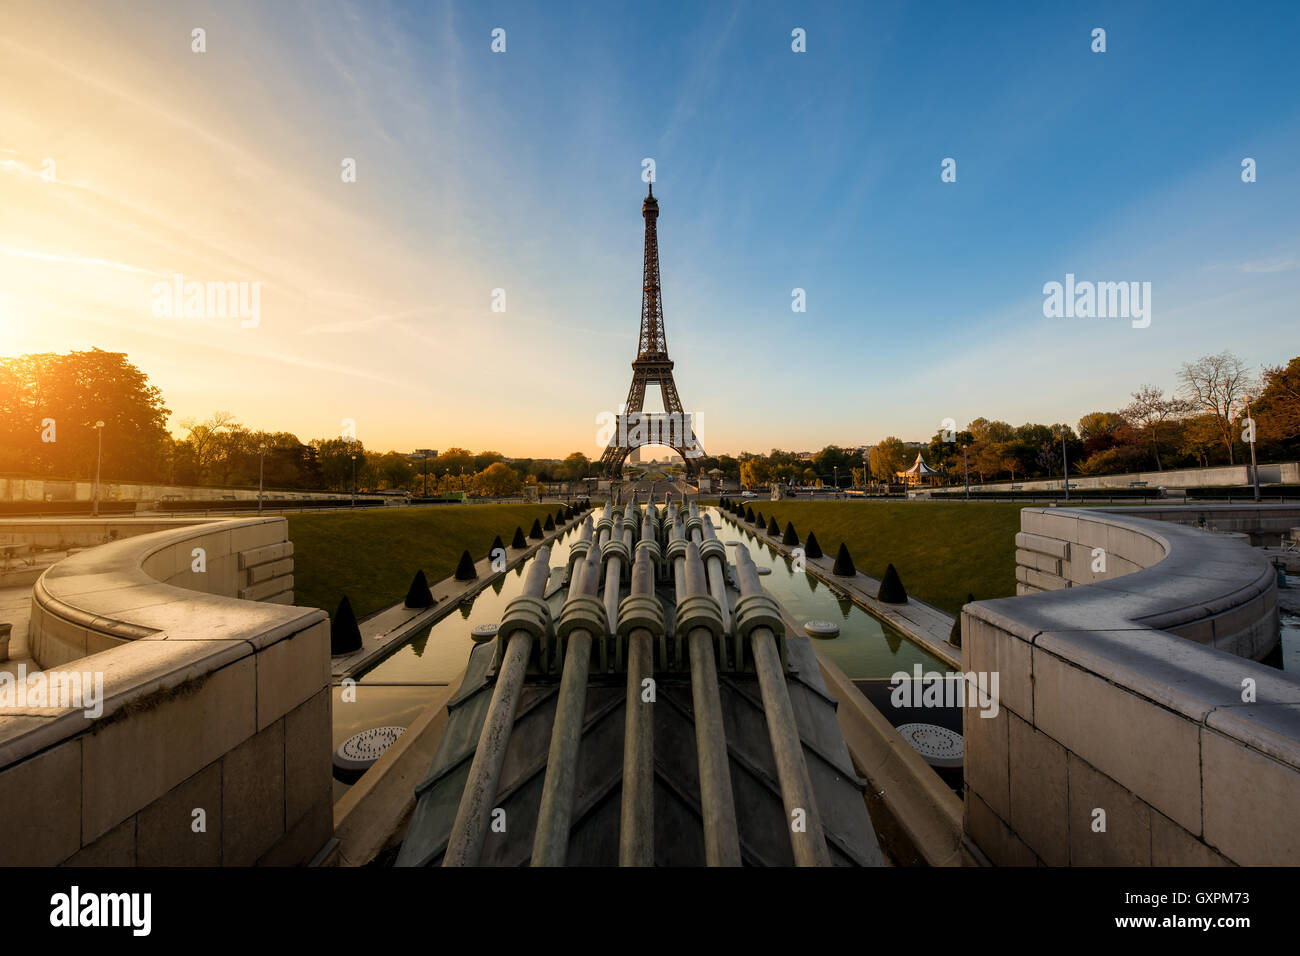 Sonnenaufgang im Eiffelturm in Paris, Frankreich. Eiffelturm ist berühmter Ort in Paris, Frankreich. Stockbild